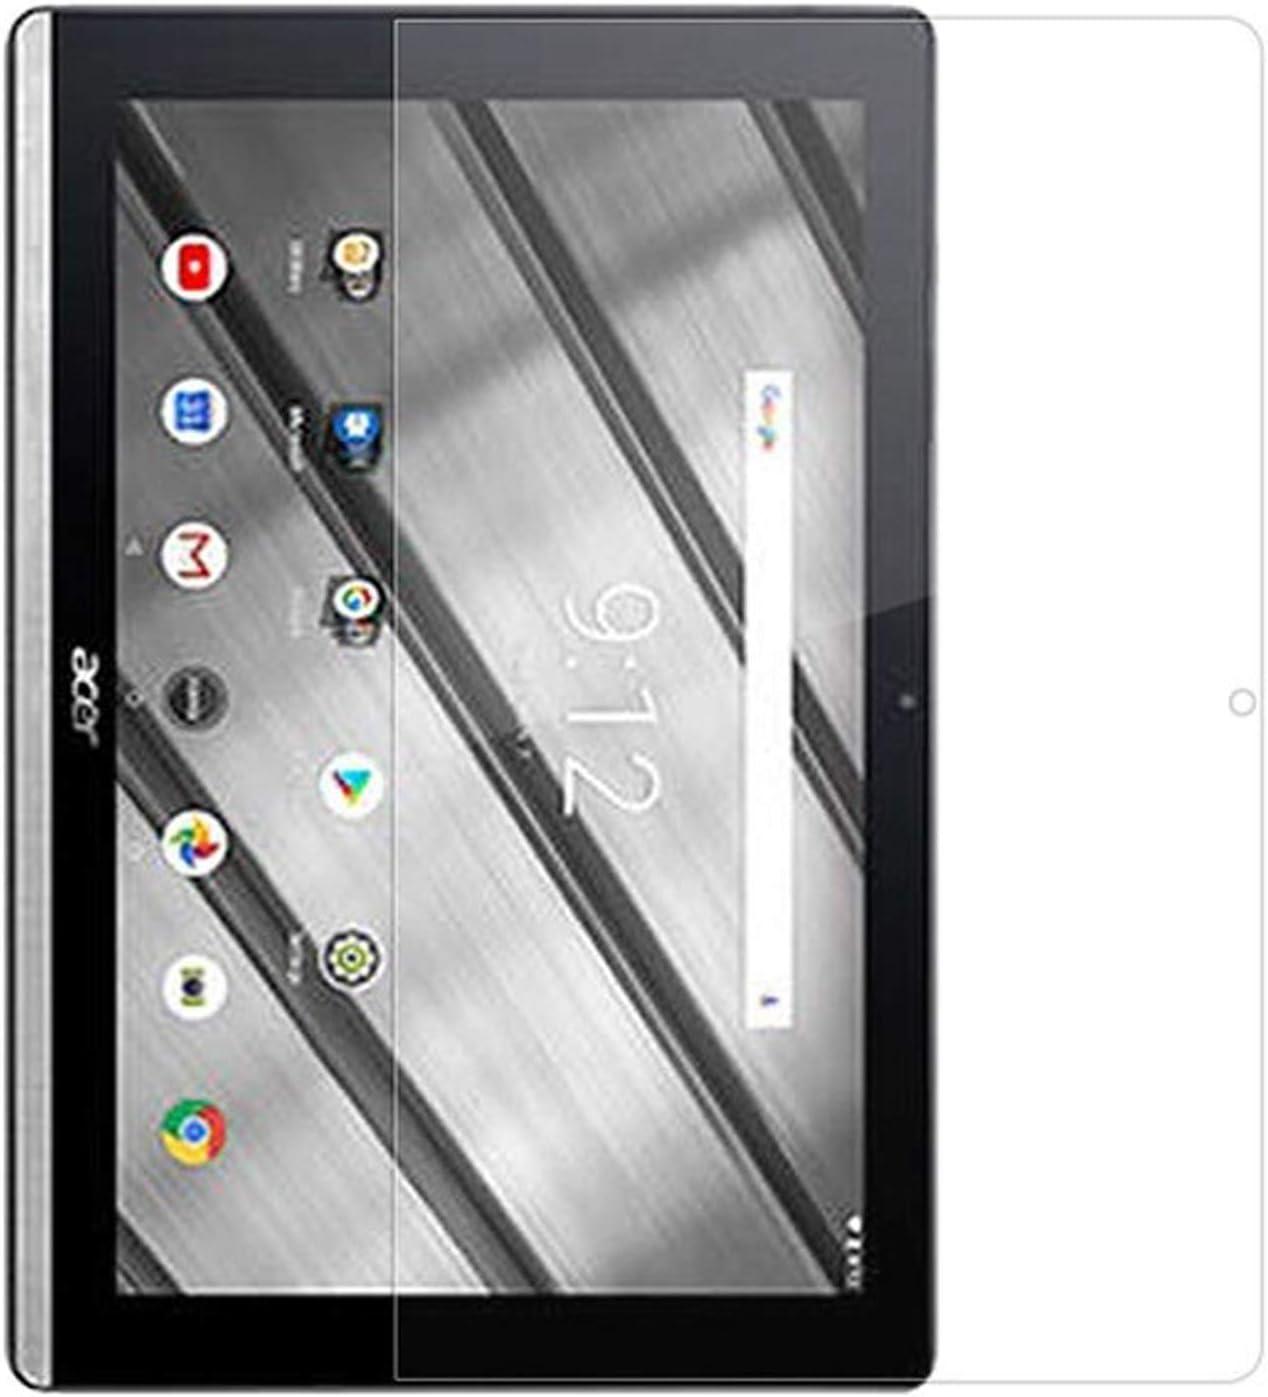 2X Anti-Glare Screen Protector Film for Acer Iconia One B3-A50 10 Inch Screen Guard Anti-Scratch Anti-Fingerprint